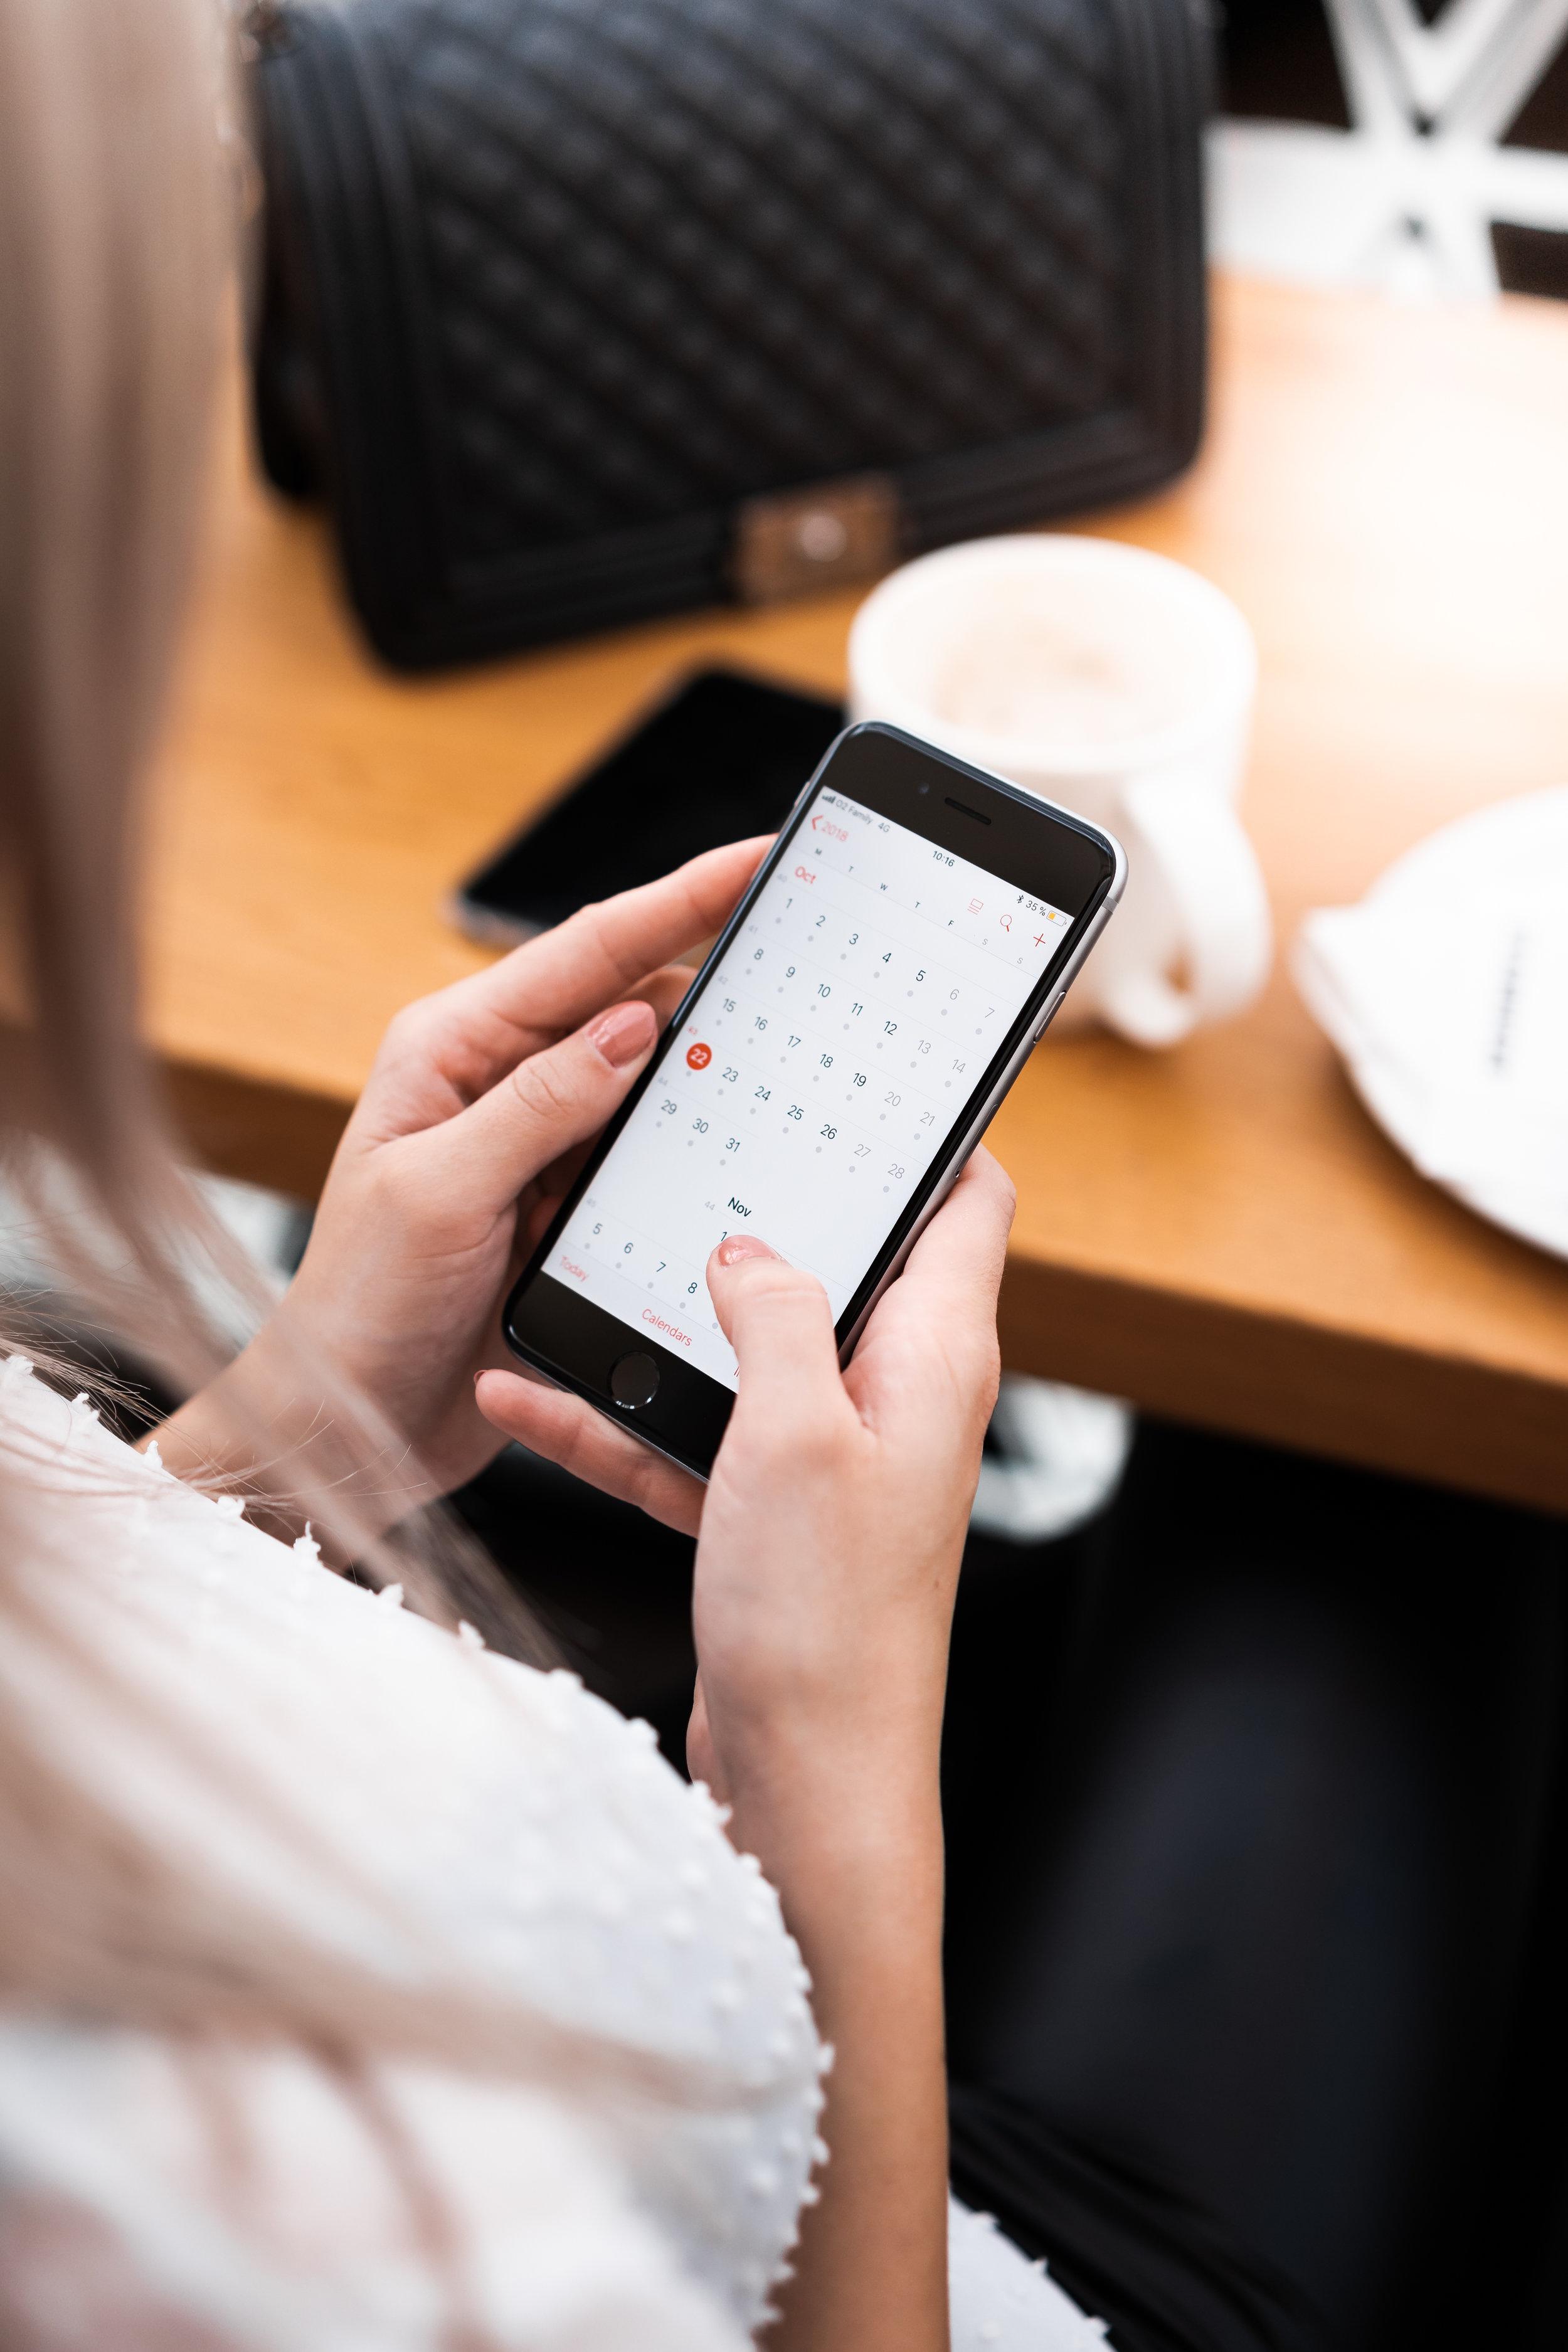 using-calendar-app-on-iphone-in-cafe-picjumbo-com.jpg